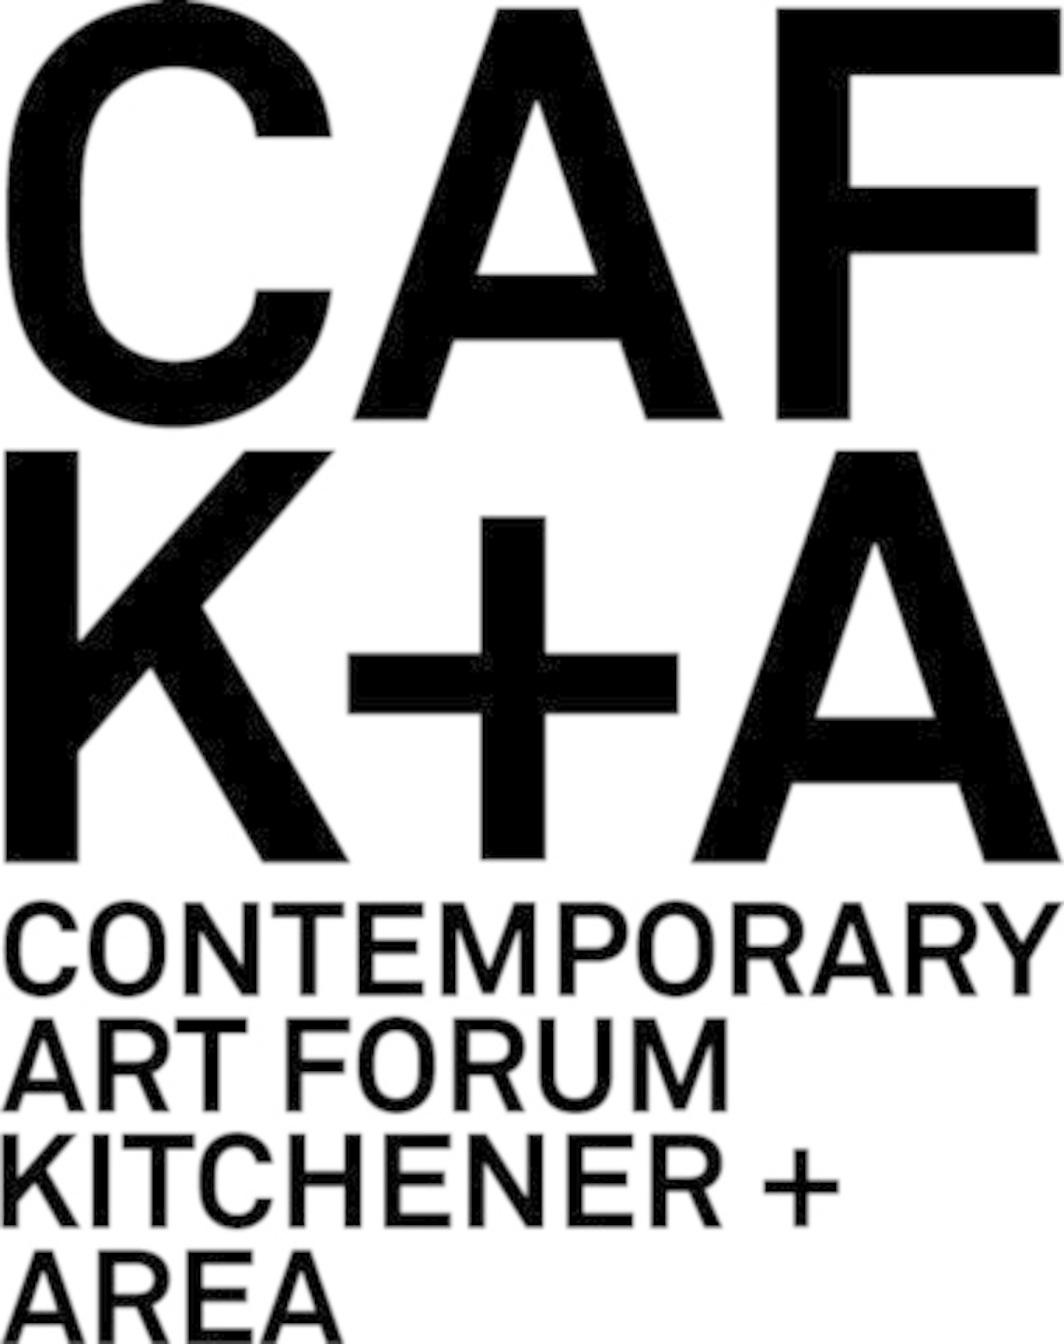 Contemporary Art Forum Kitchener + Area (CAFKA) - Artguide – Artforum  International